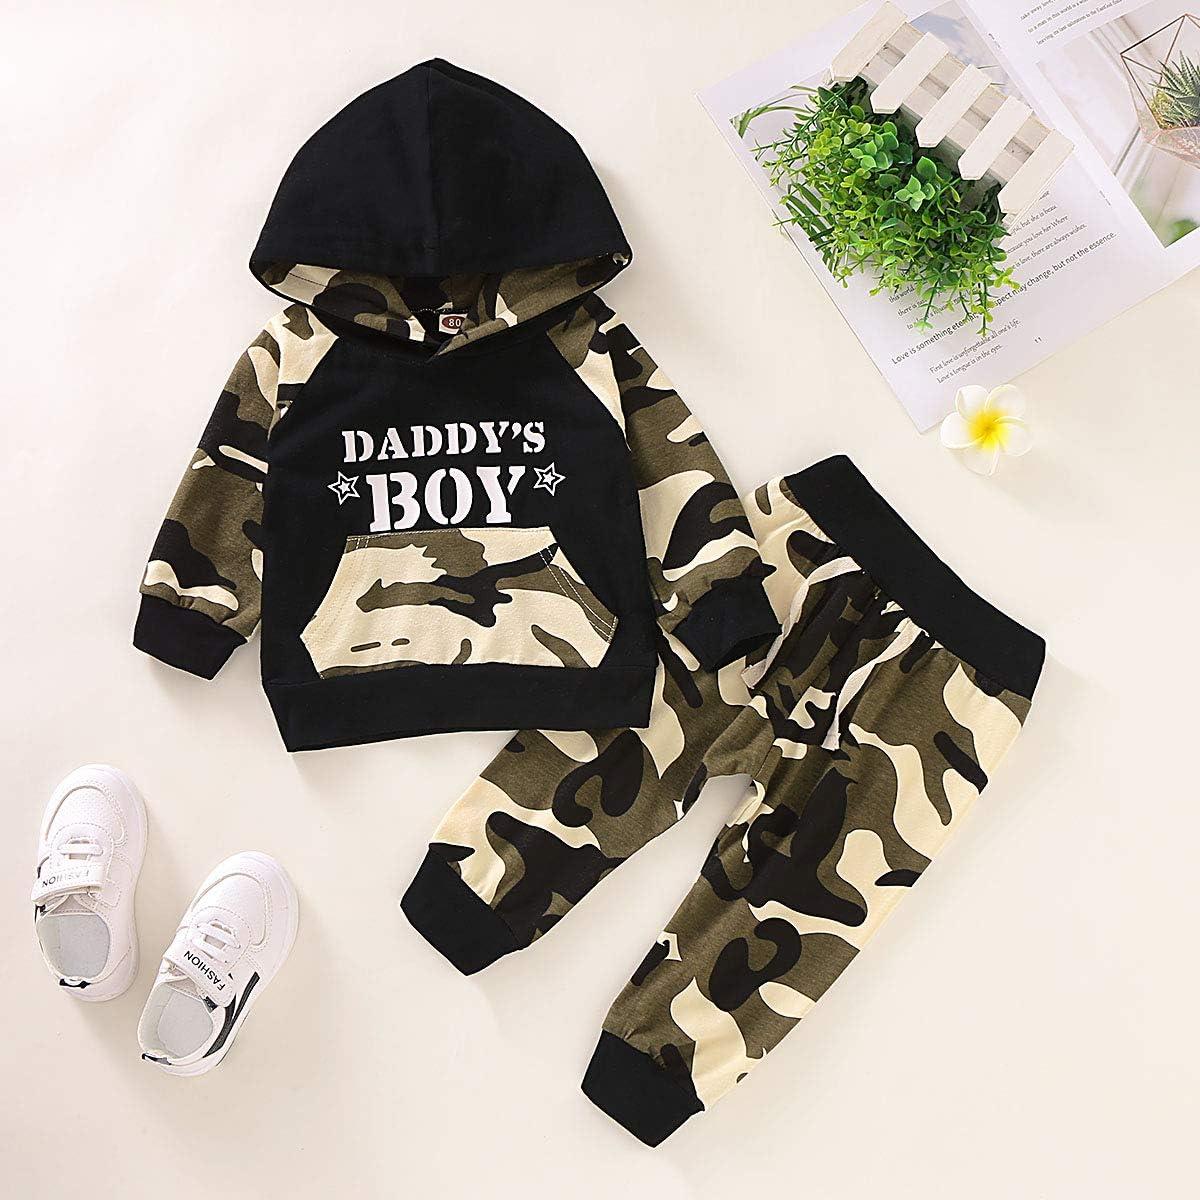 Pants Kleinkind Hoodie Outfit Set Neugeborenen Papas Boy Camouflage Kleidung Set Infant Hoodies Top